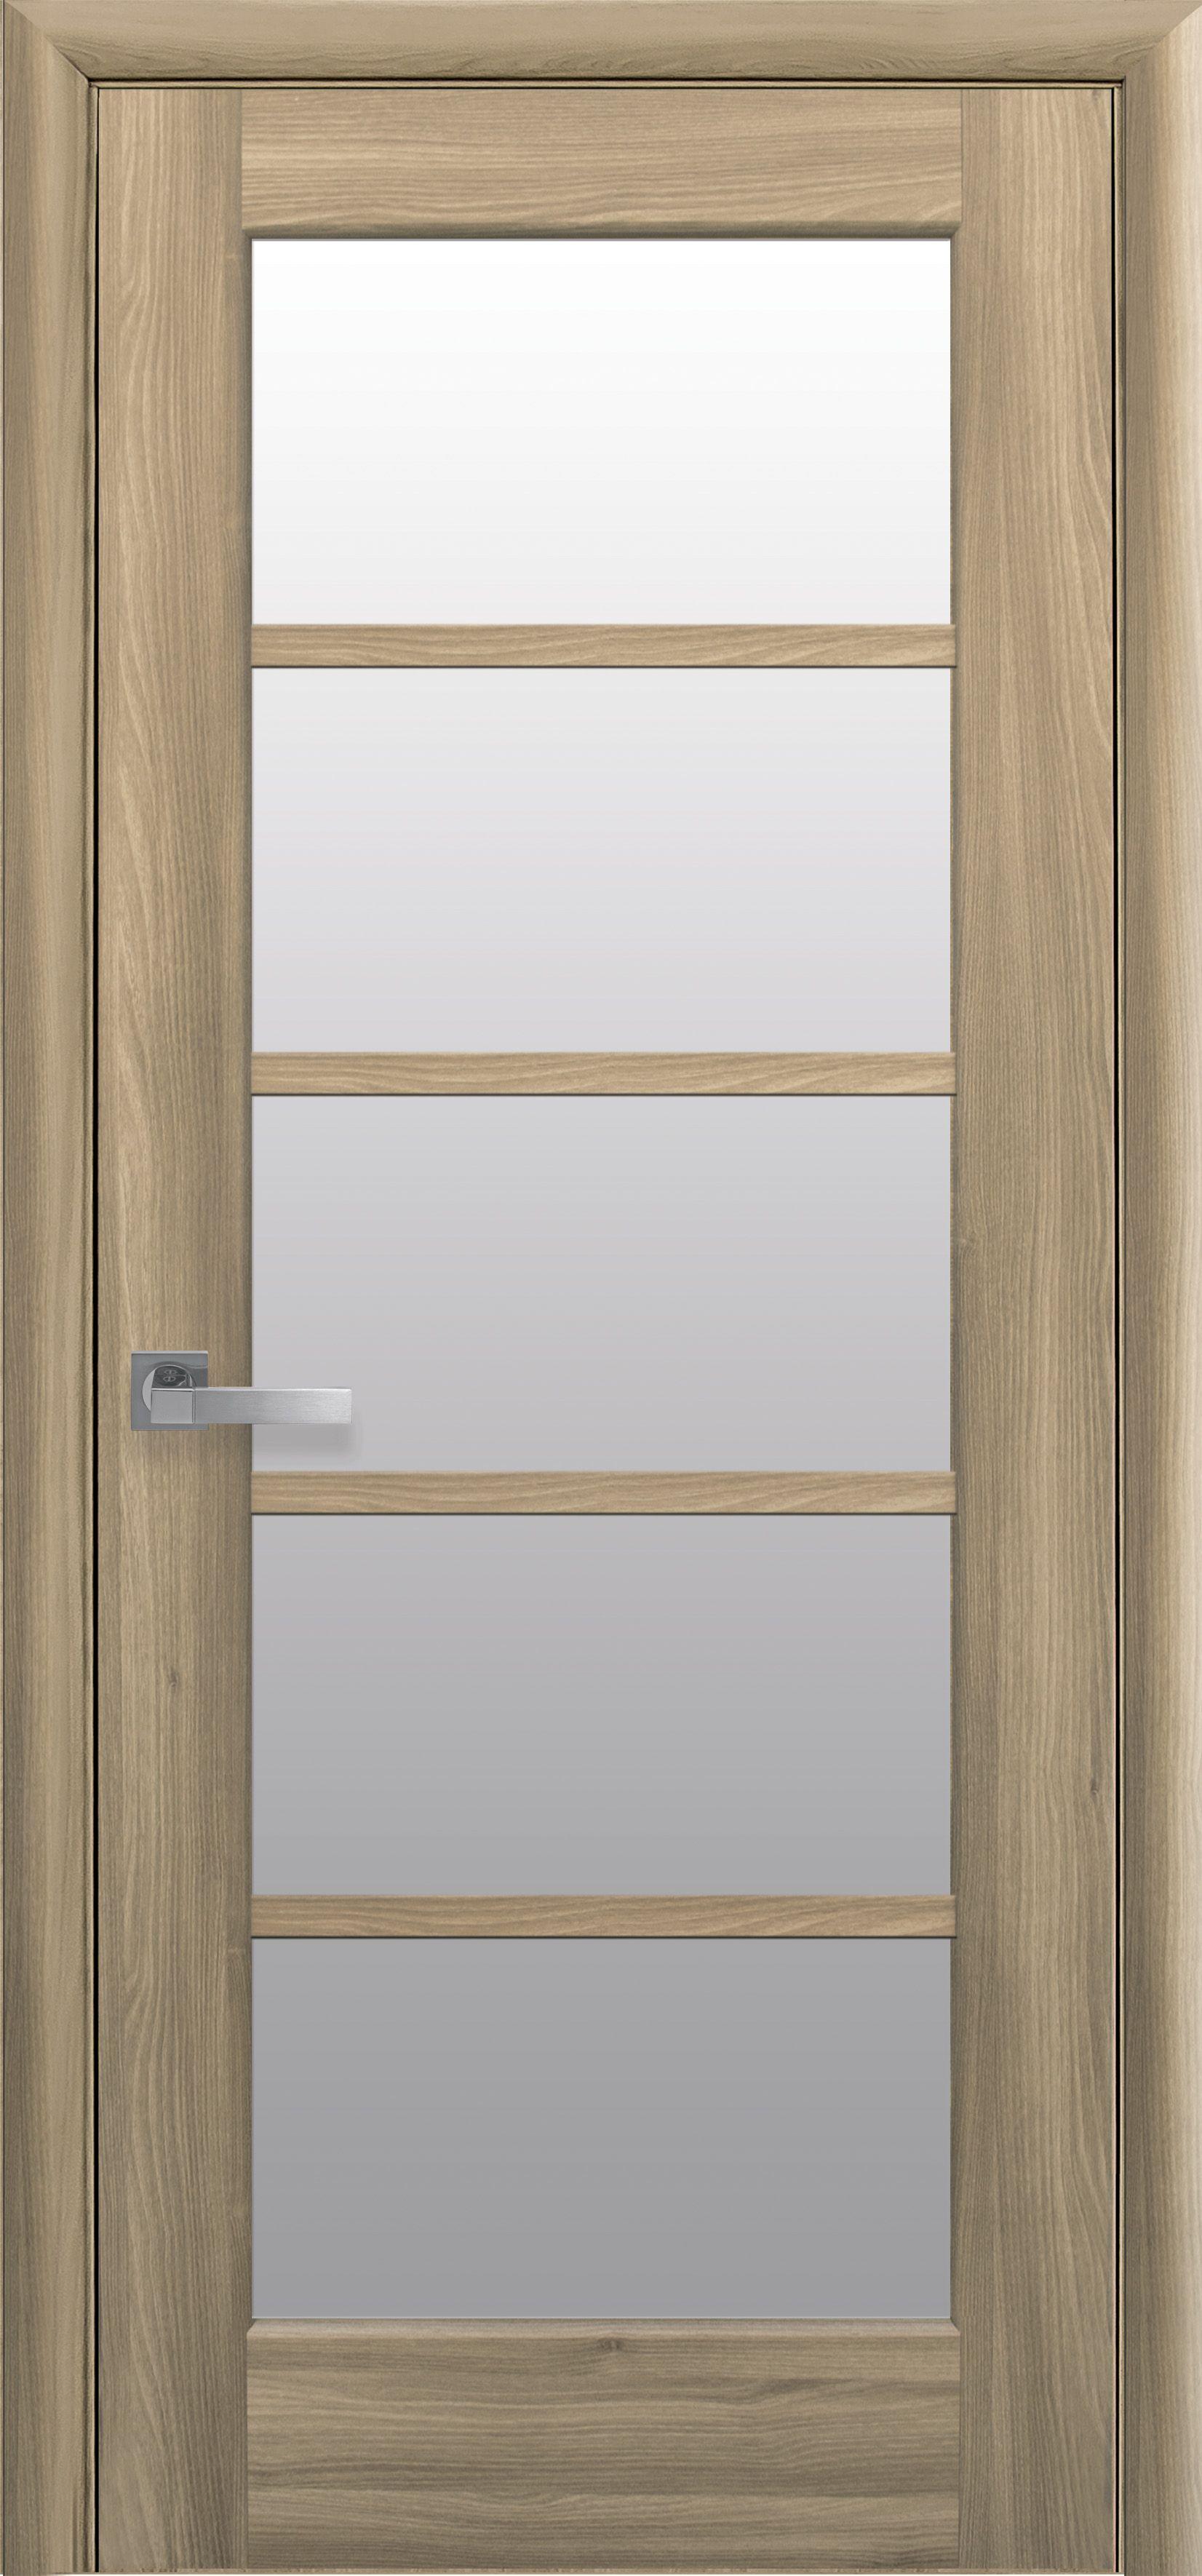 Межкомнатные двери Муза со стеклом сатин